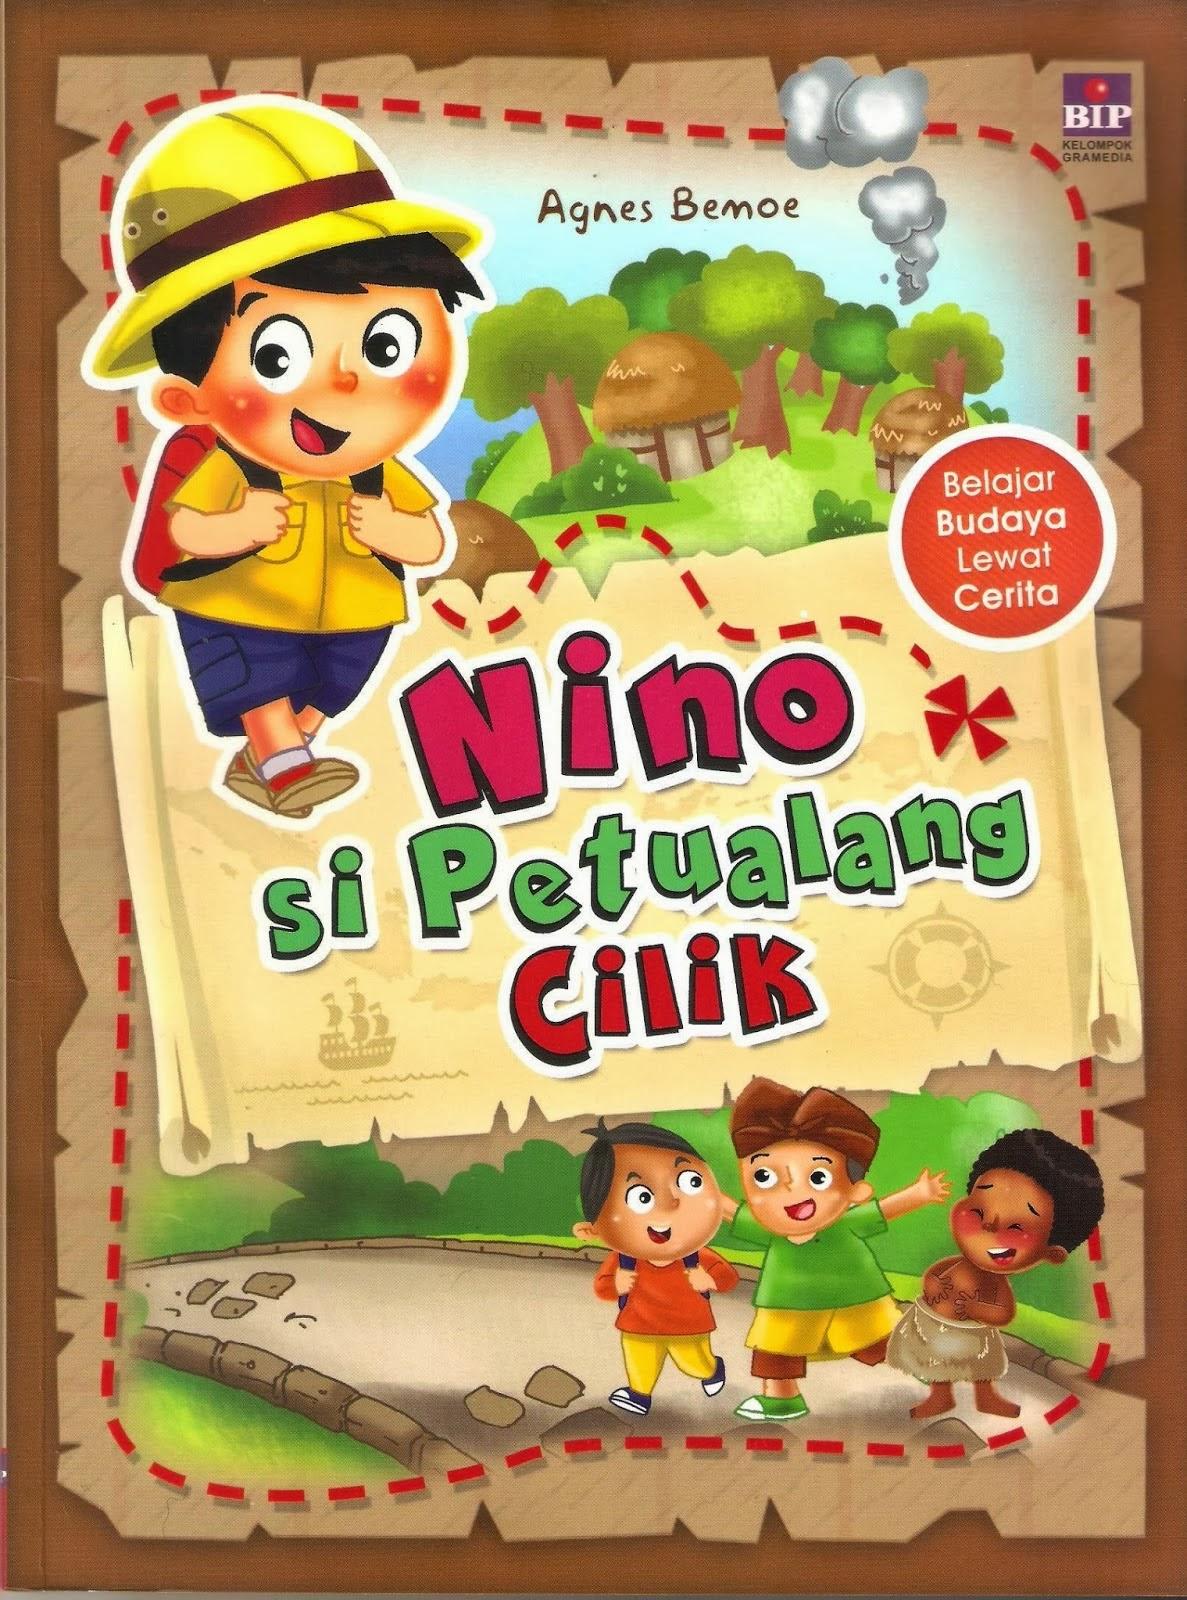 http://astribukuanak.blogspot.com/2014/02/nino-si-petualang-cilik.html